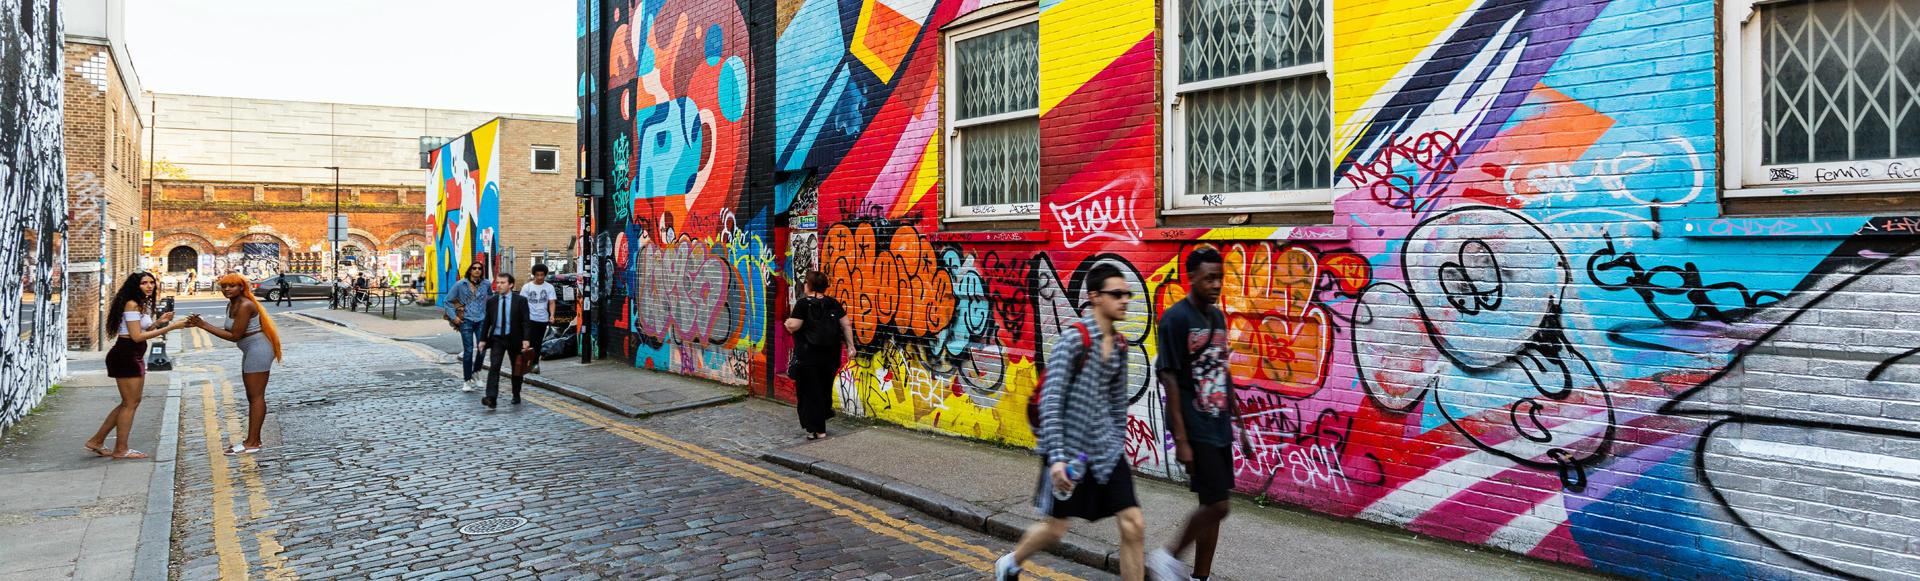 Bethnal Green, London